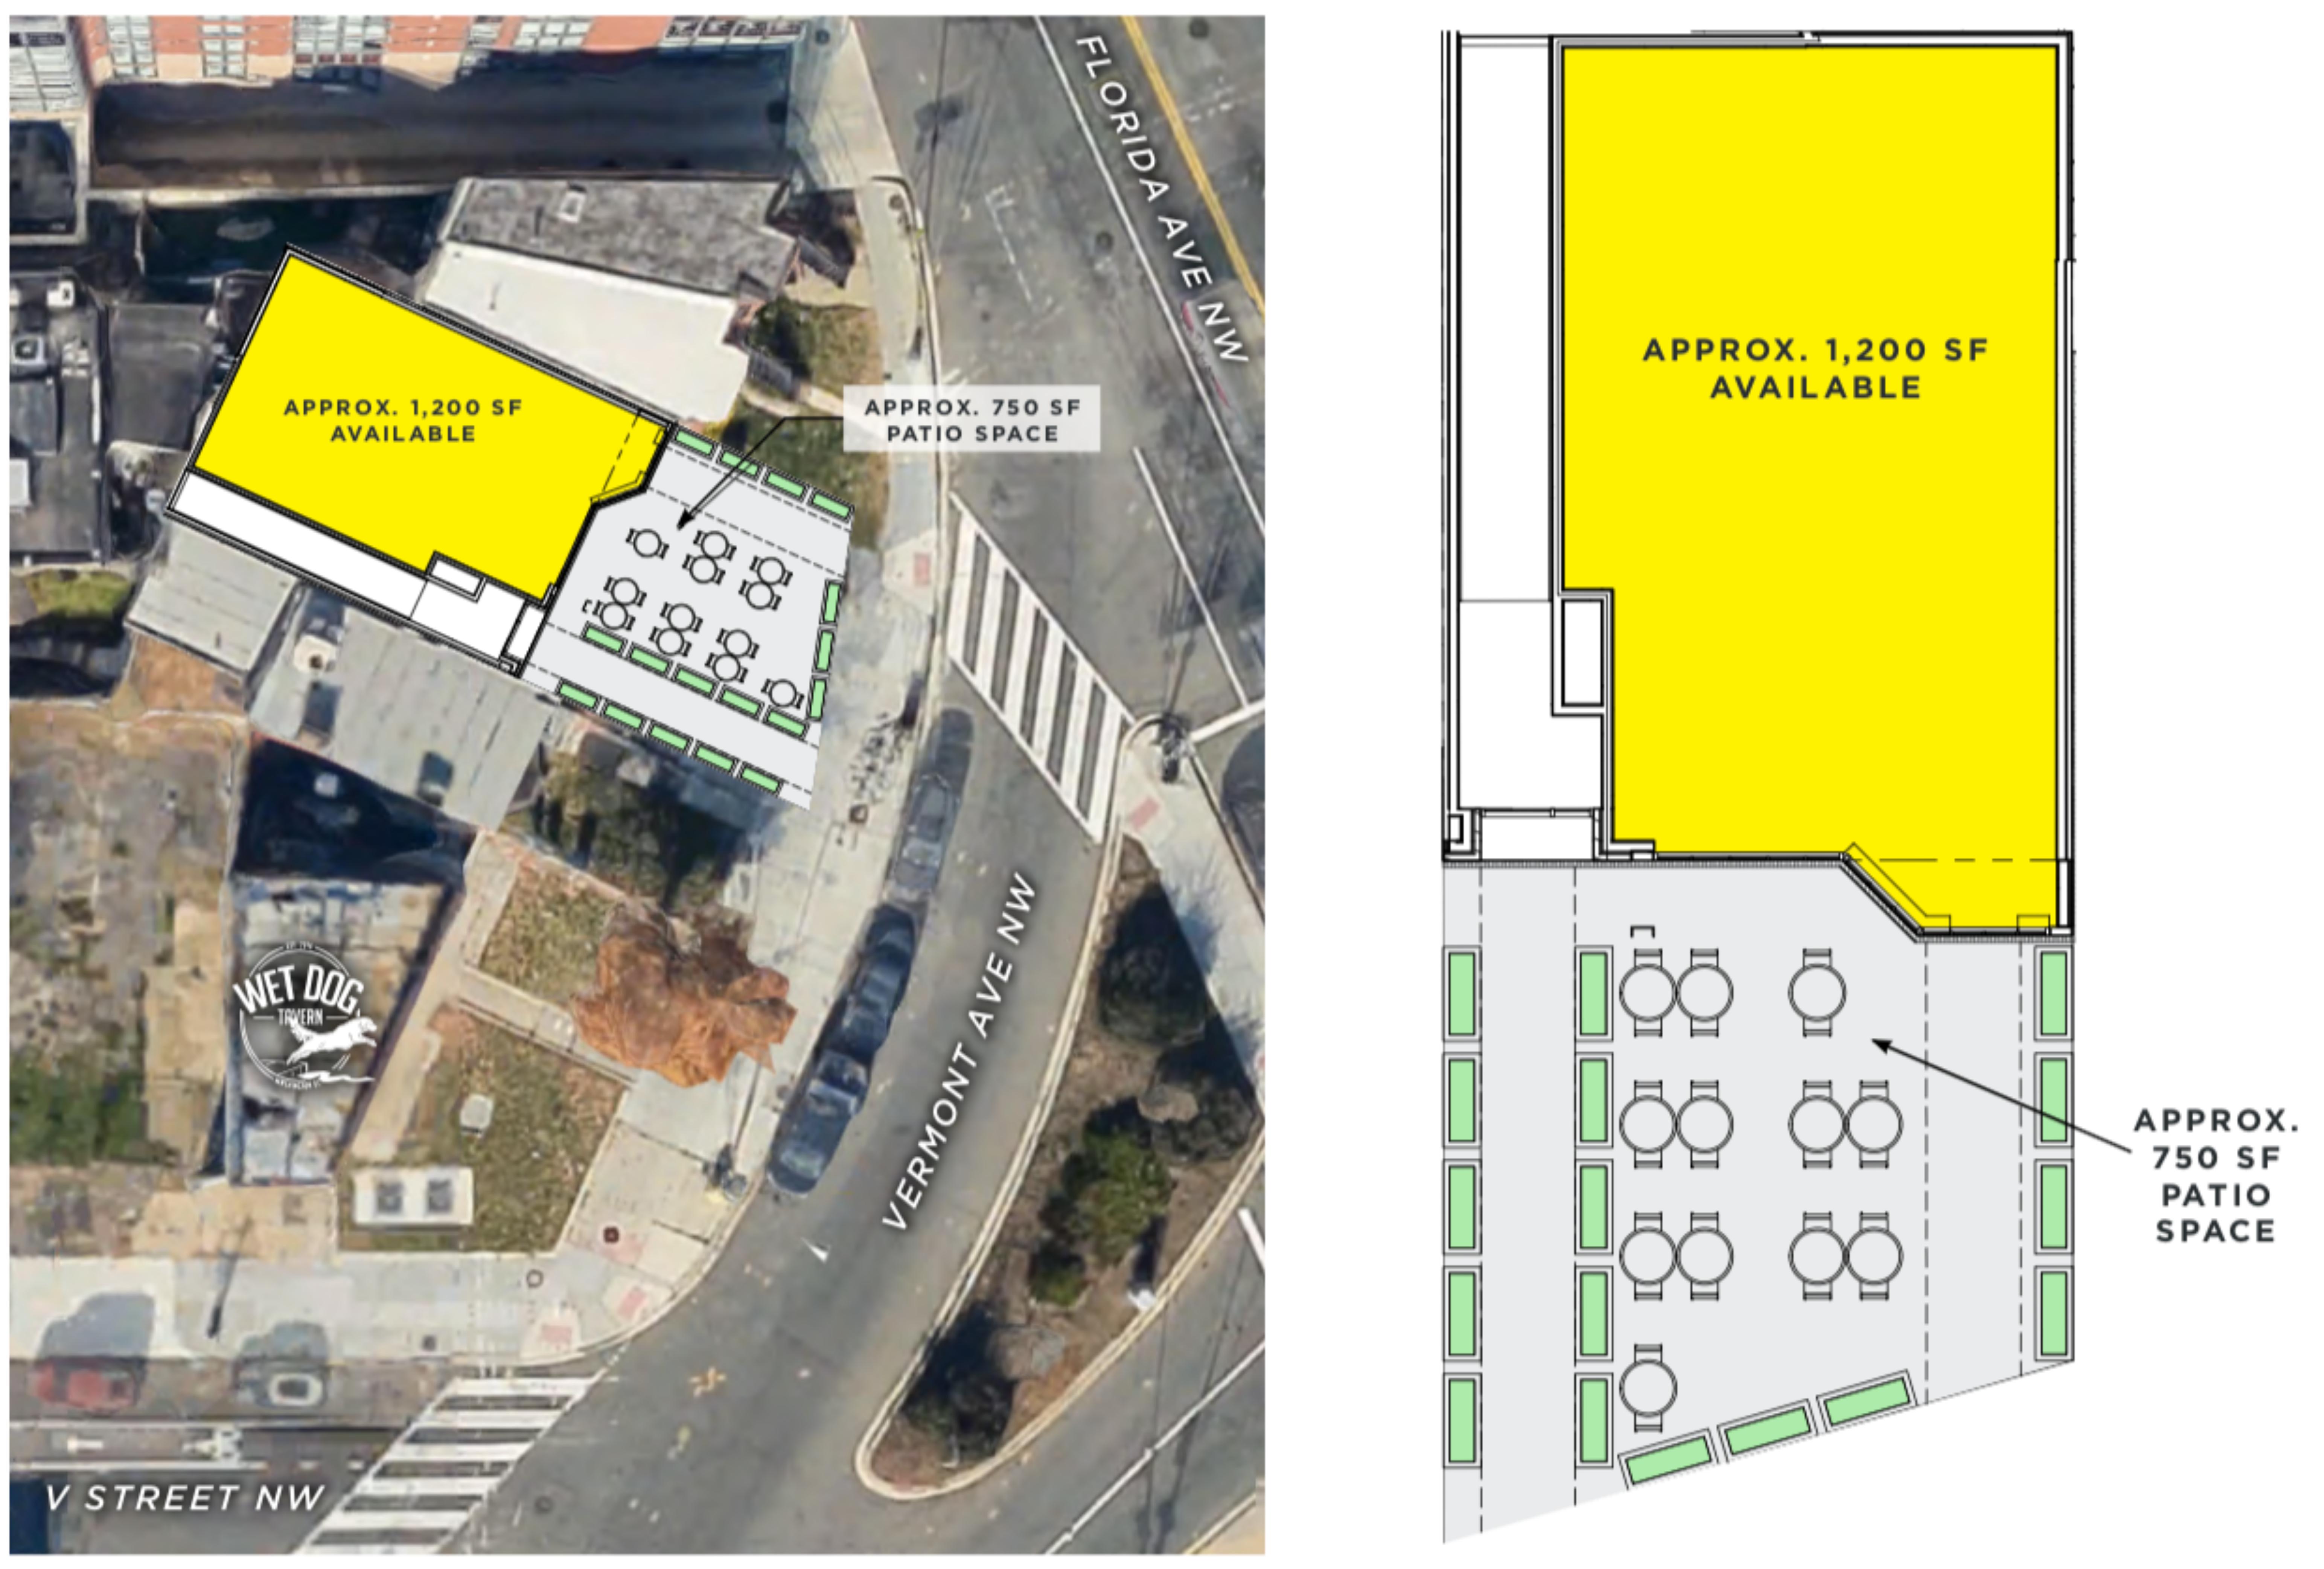 2106 Vermont Avenue NW: site plan